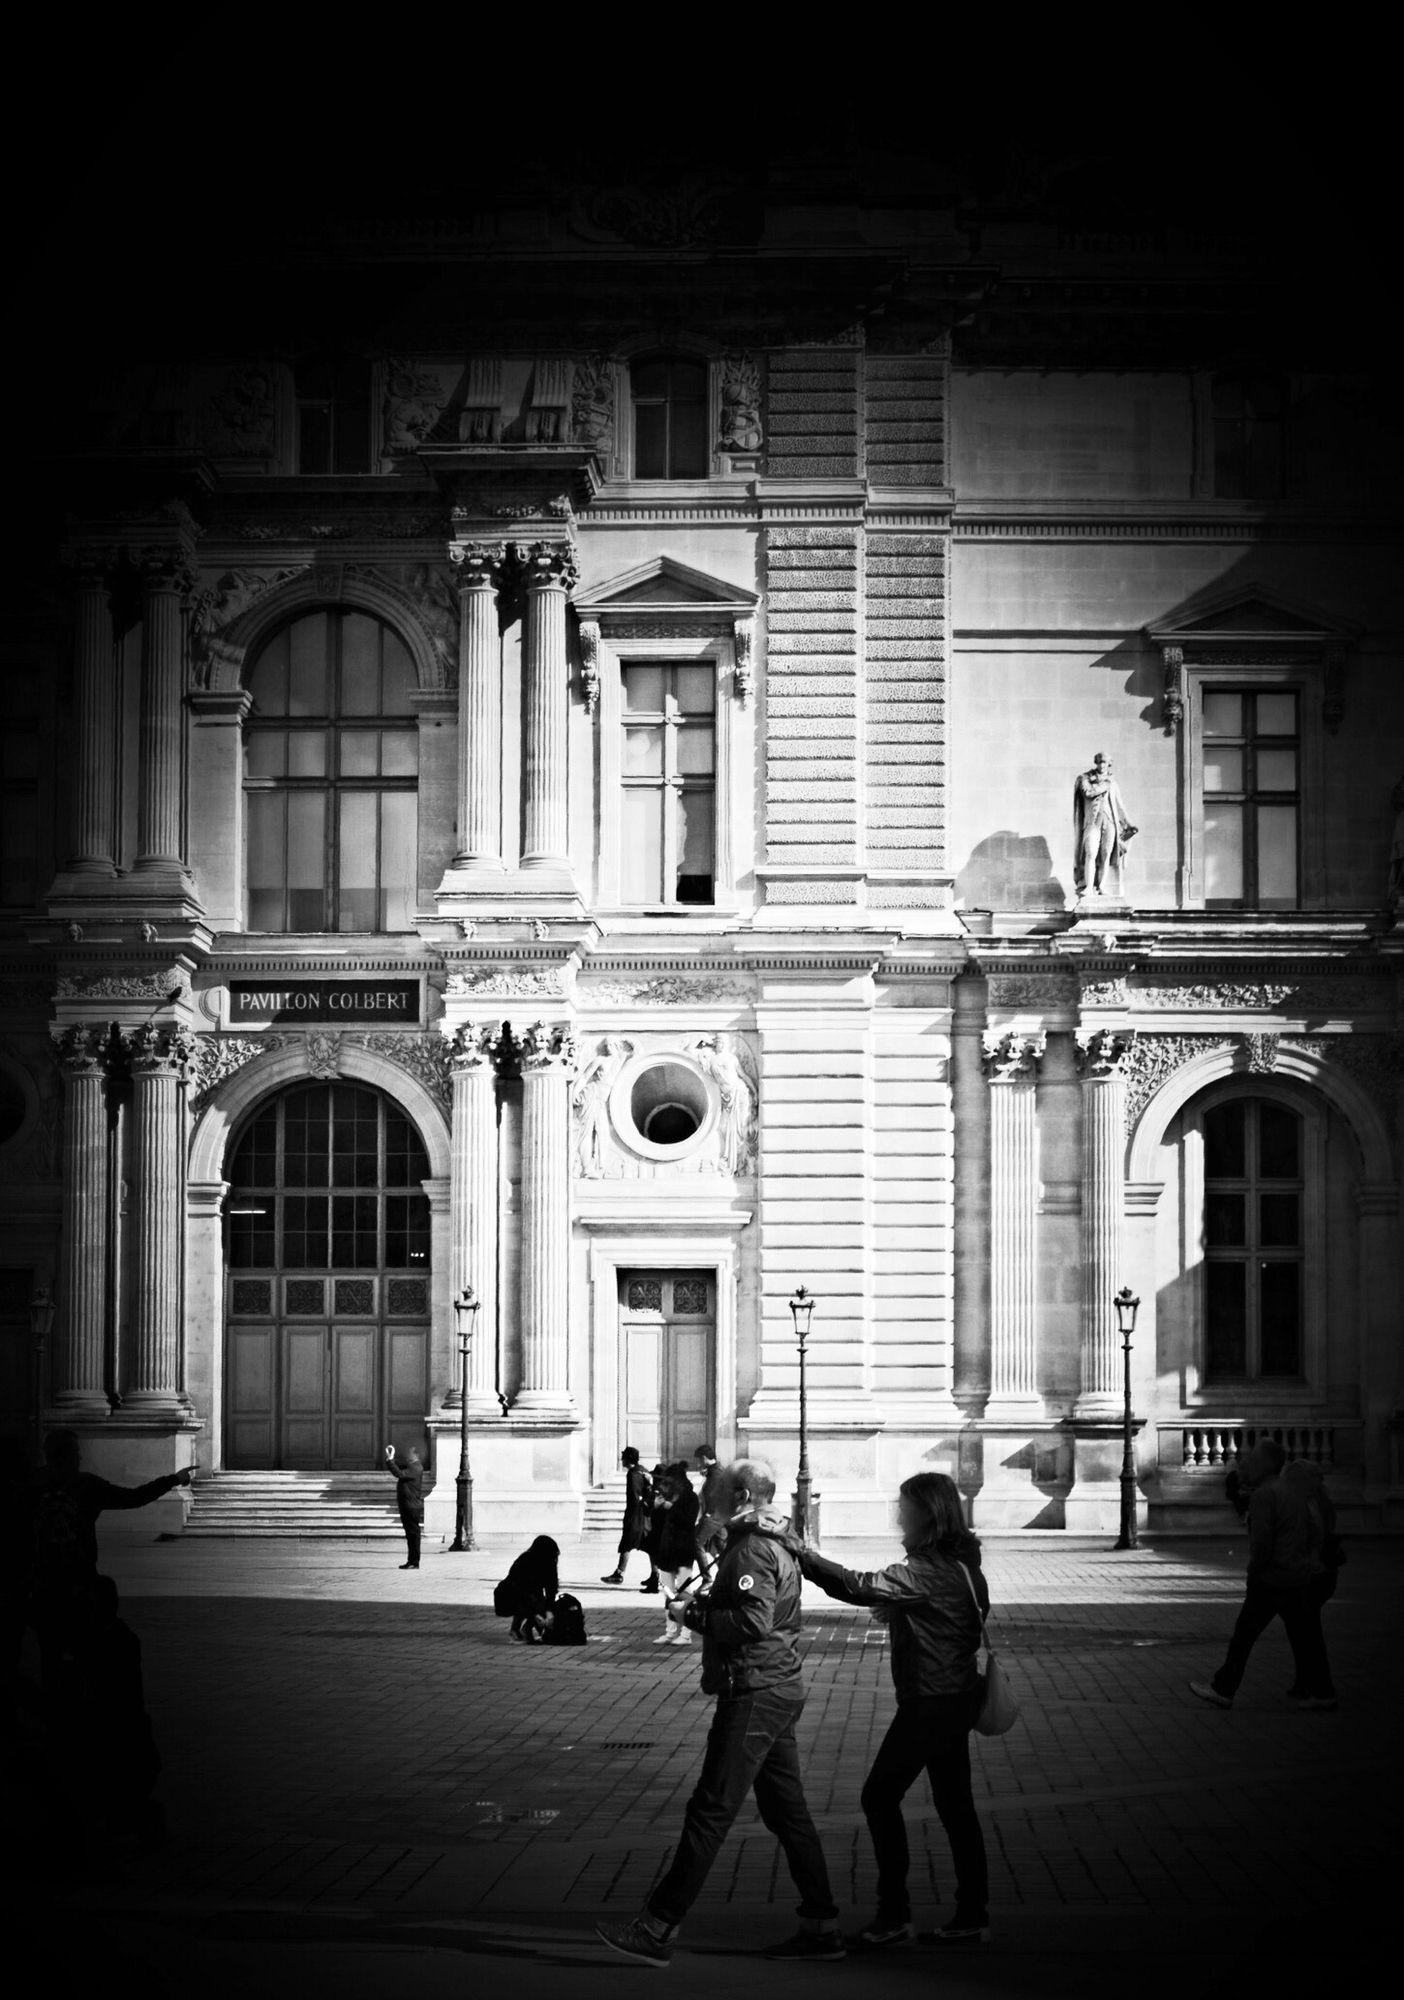 Louvre Museum -Pavillon Colbert